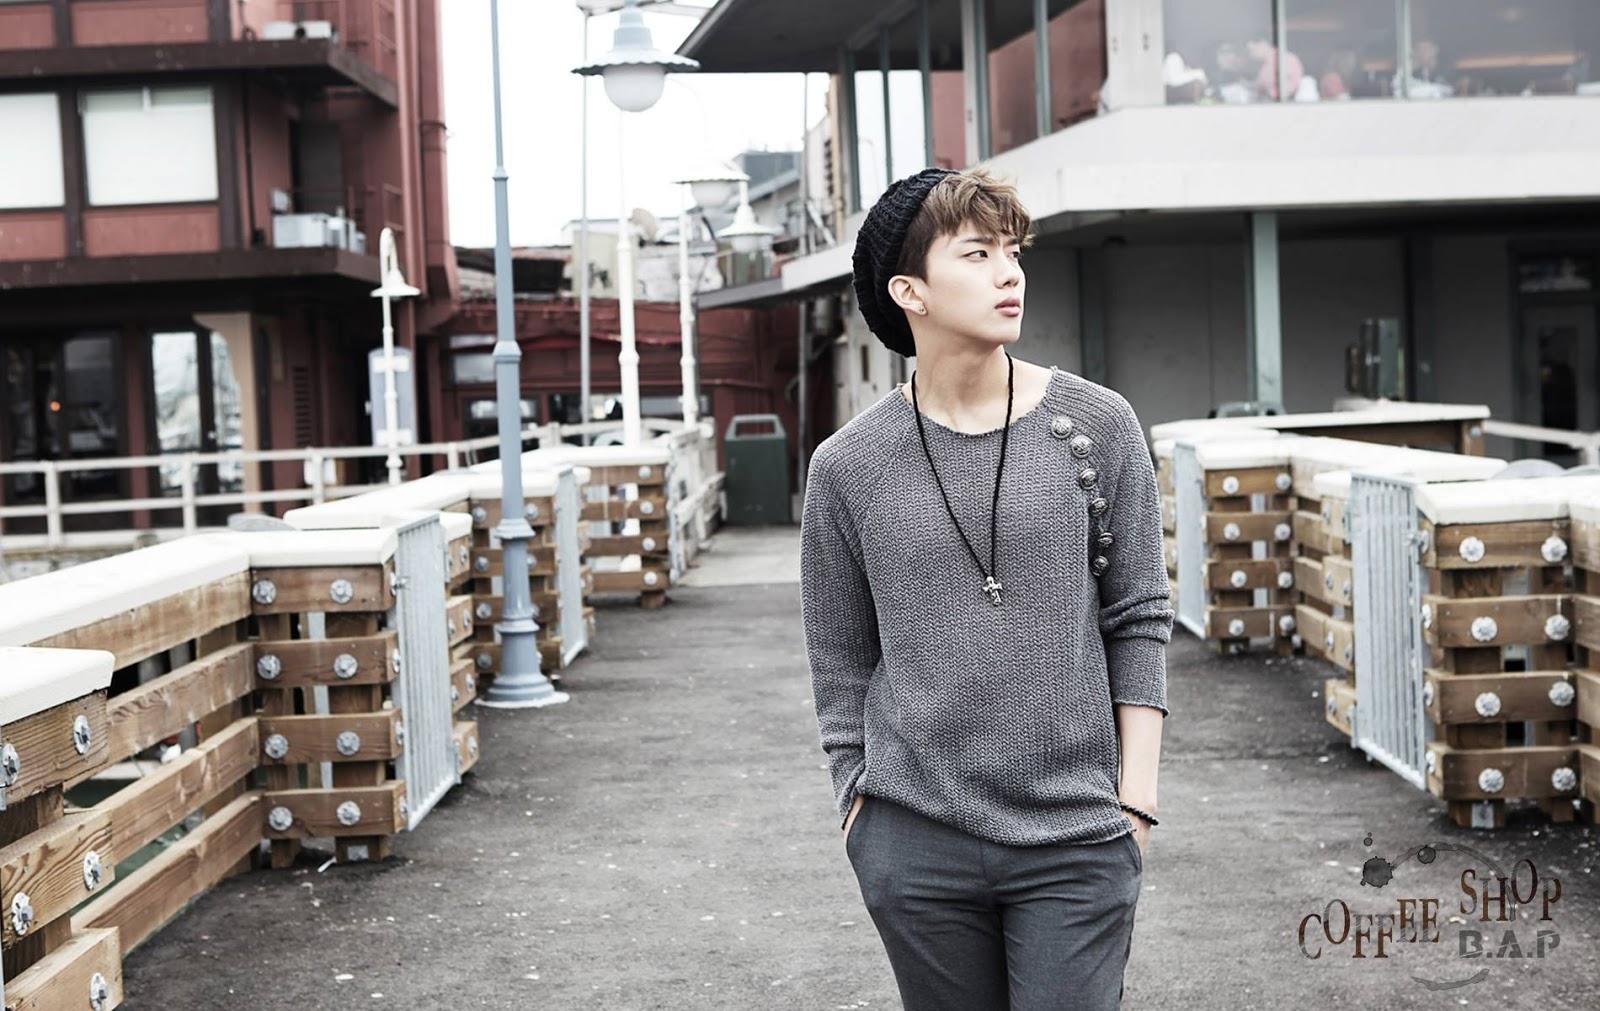 K-POP: B.A.P - Coffee Shop (Photoshoot)